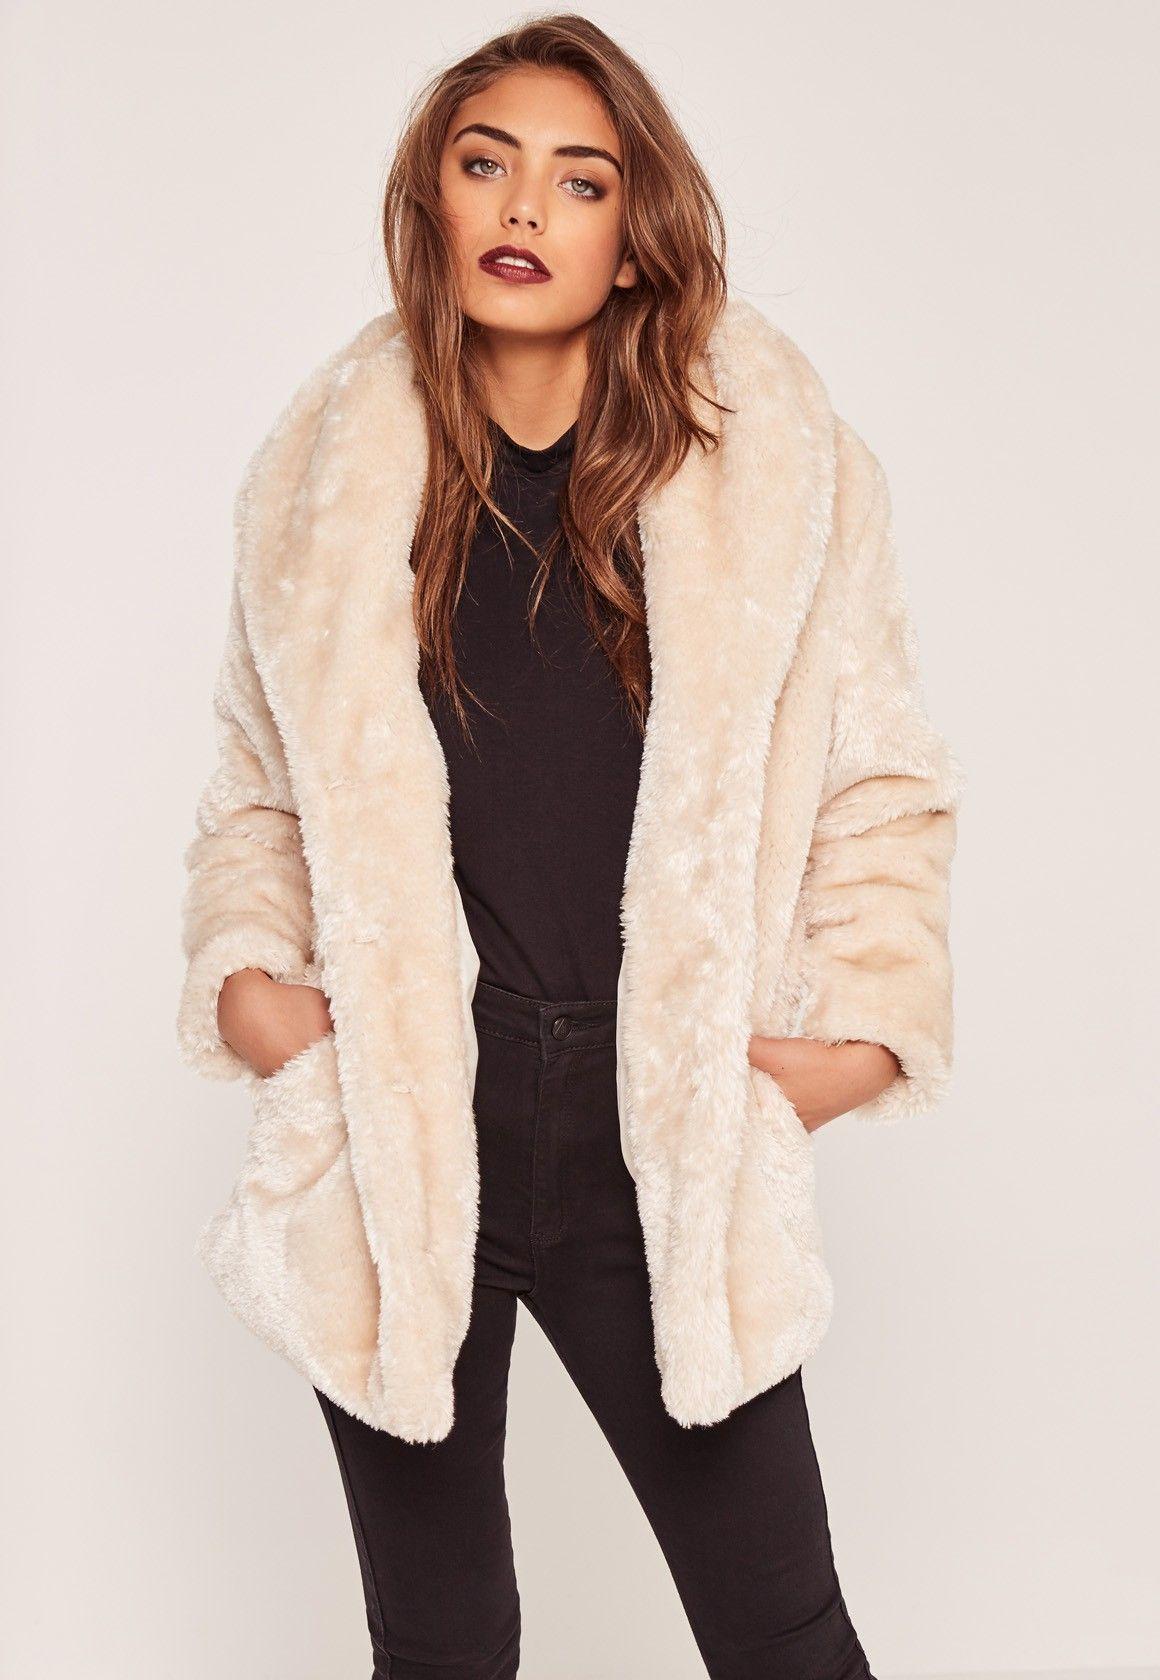 Missguided - Petite Pressed Faux Fur Coat Cream | Real Job Real ...